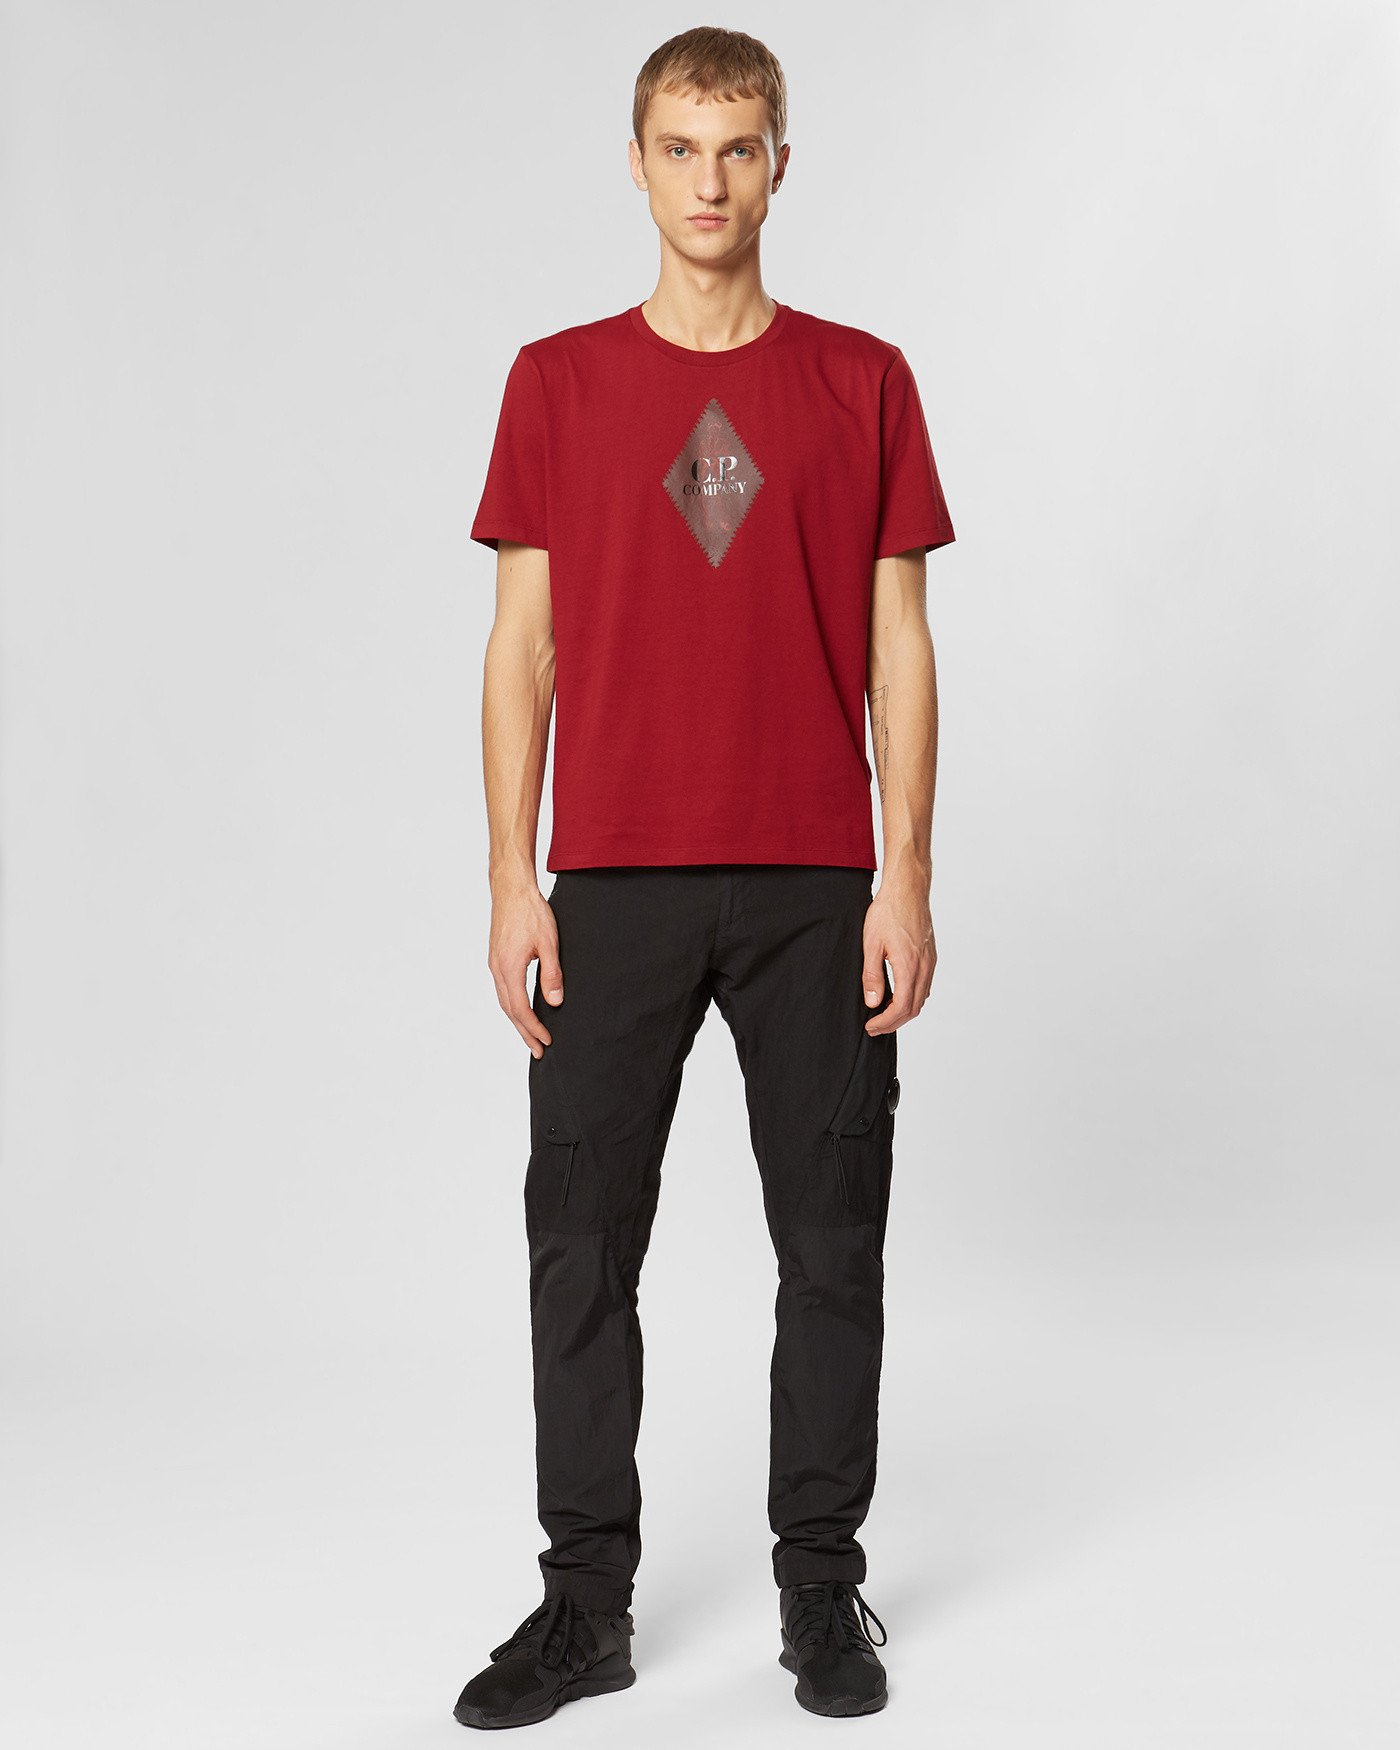 T-Shirt aus 30/1-Jersey mit rautenförmigem Logo-Print